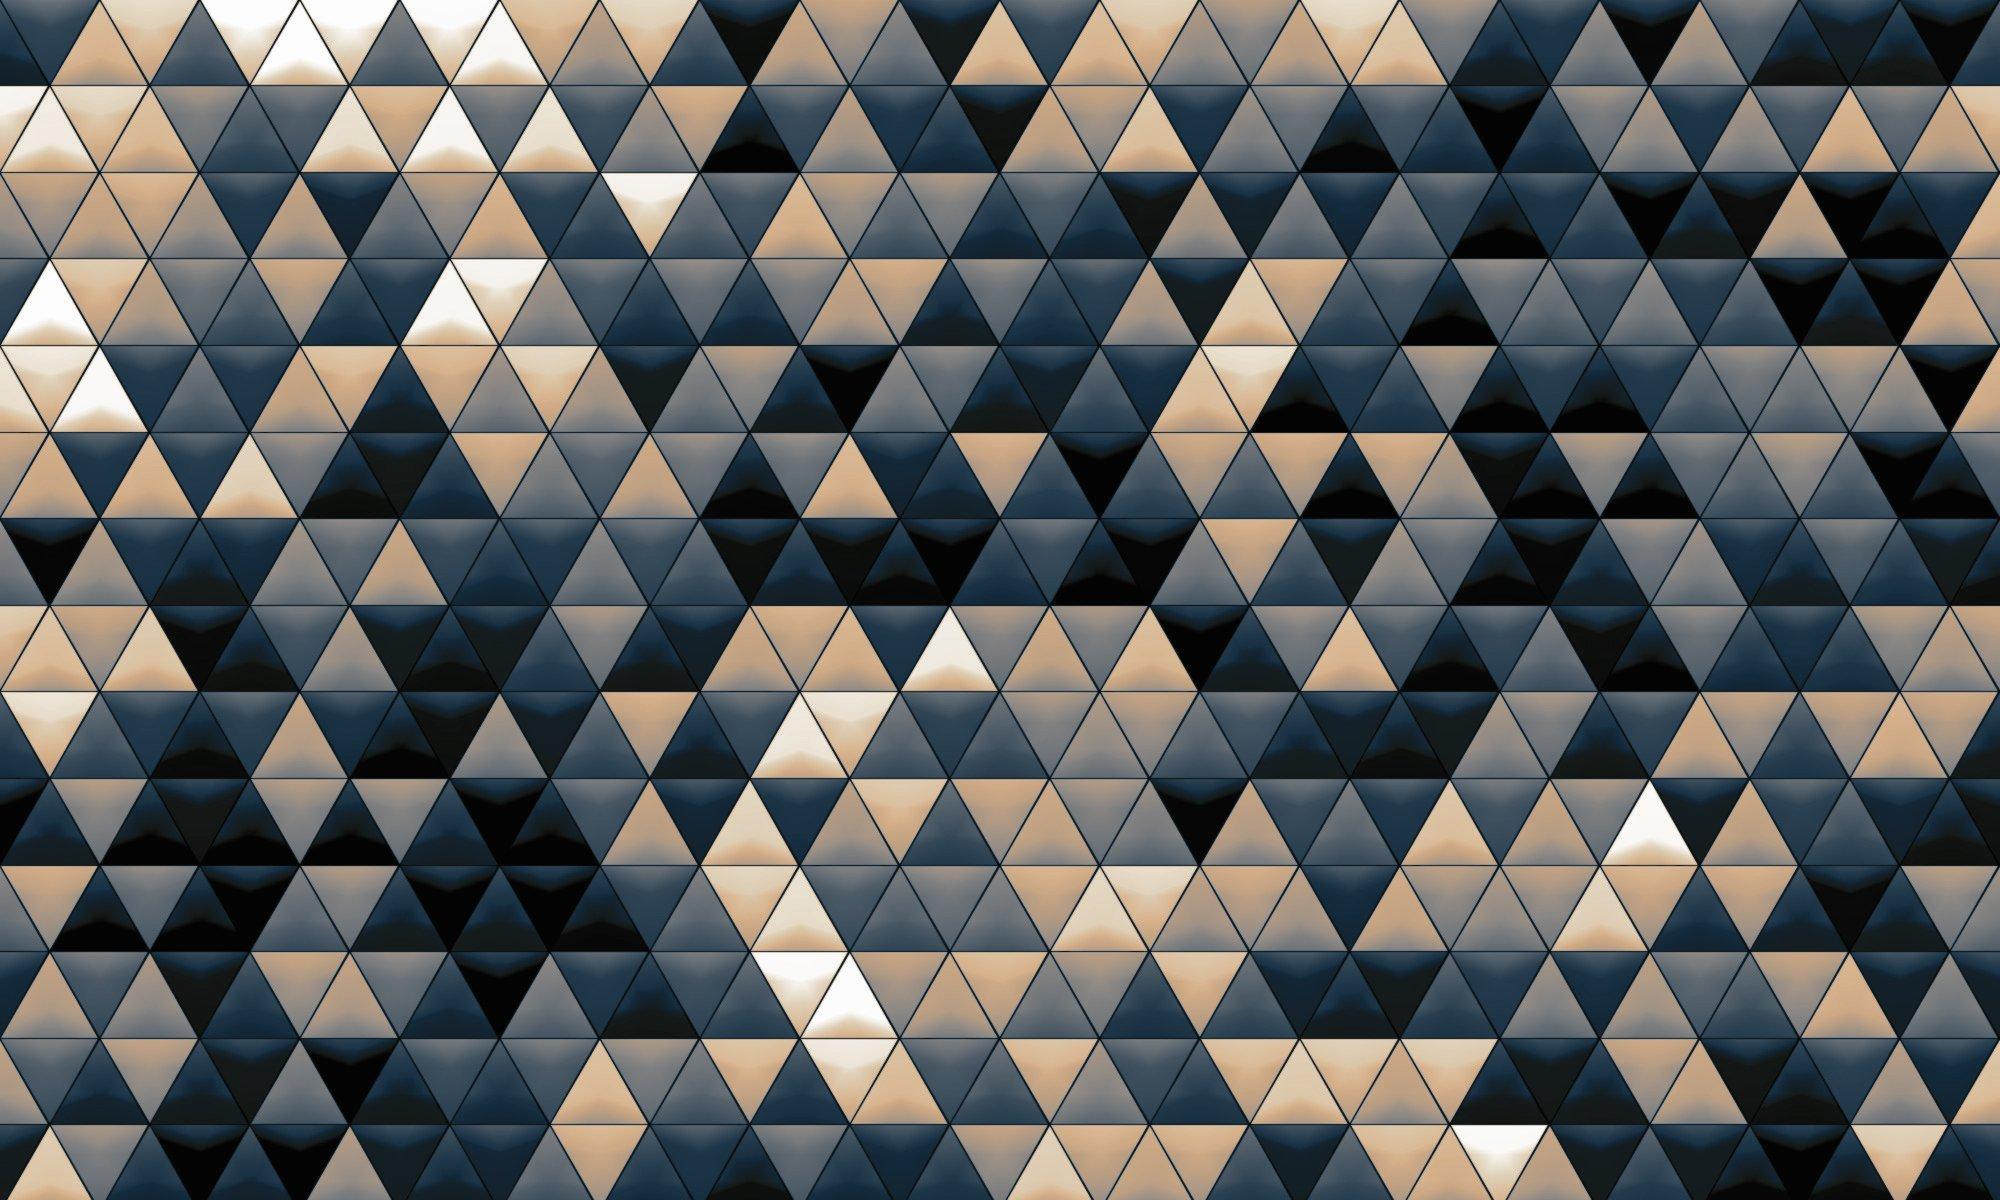 Gray tiles images, stock photos vectors